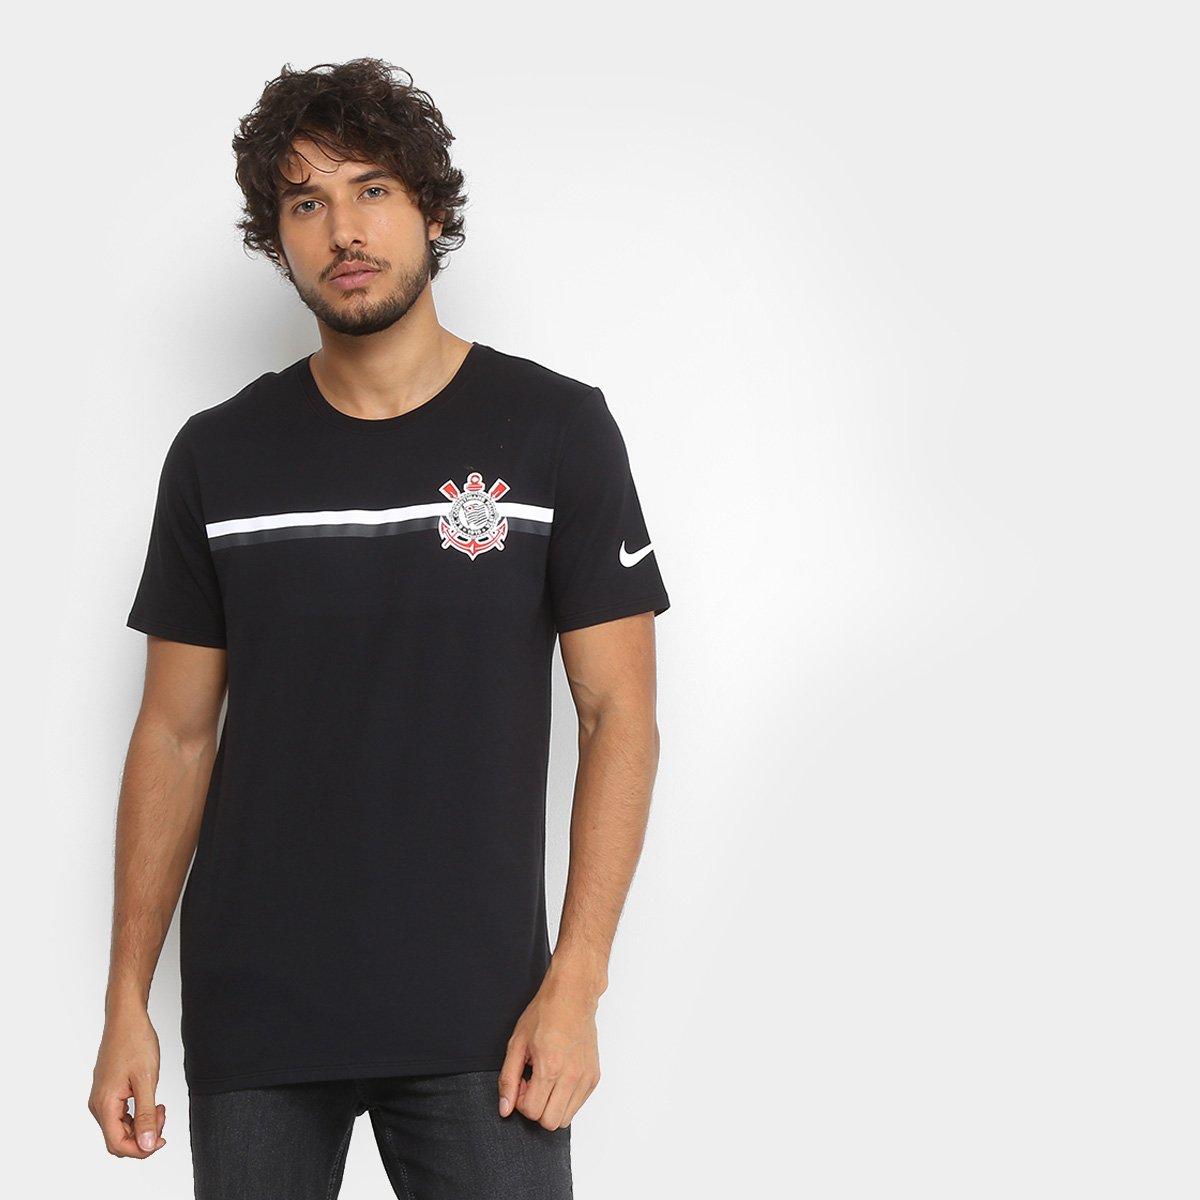 Camiseta Corinthians Nike Crest Masculina - Preto - Compre Agora ... ee6bceb3ae21f